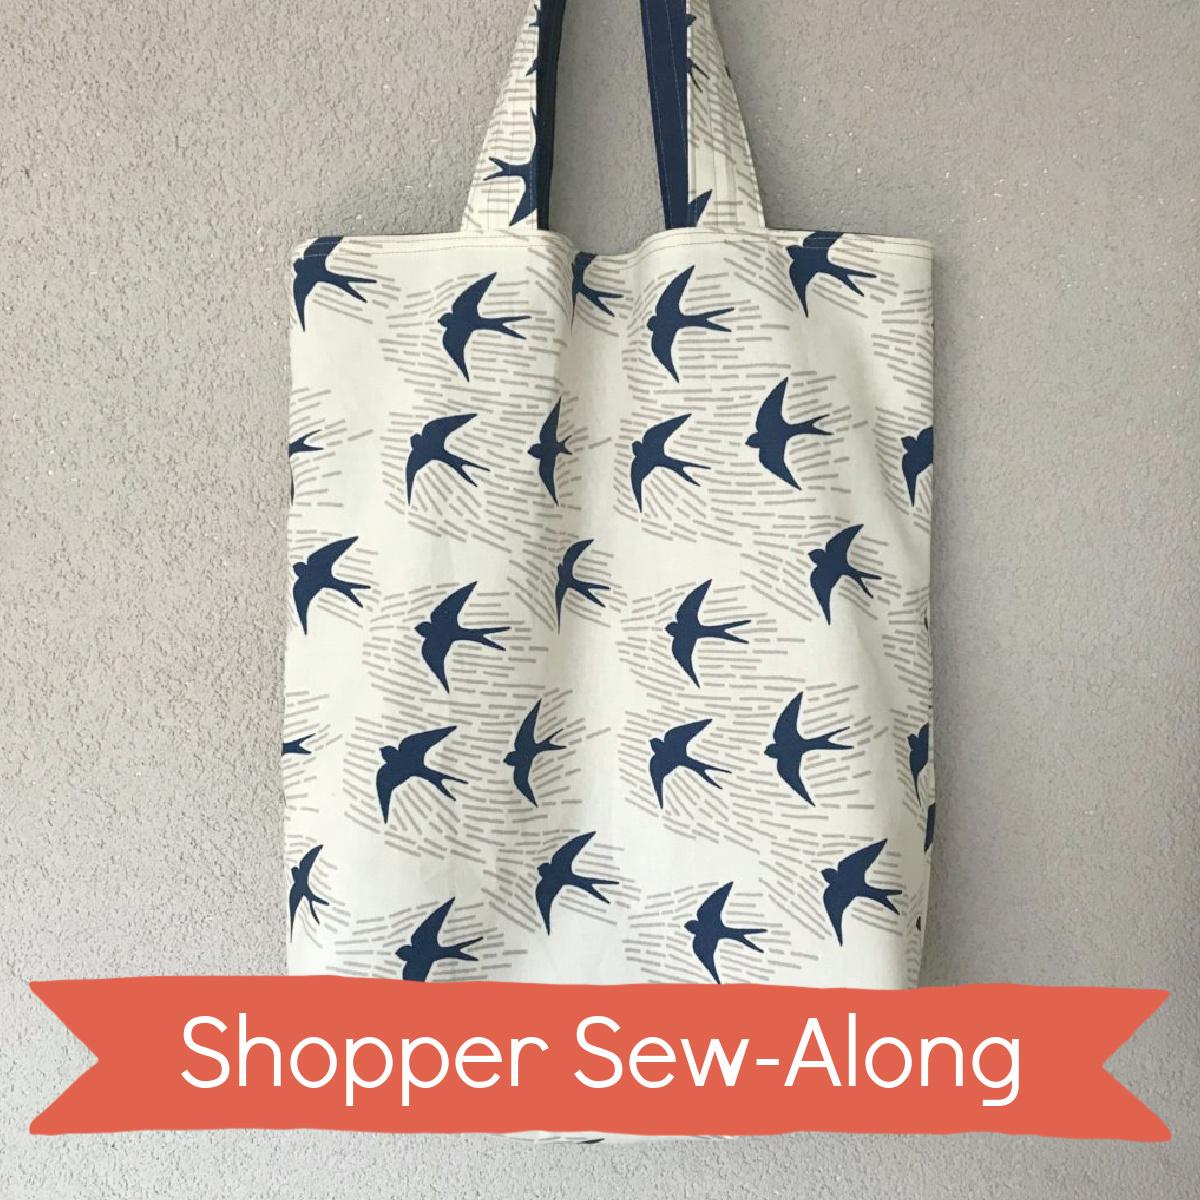 keerbare shopper Sew-Along